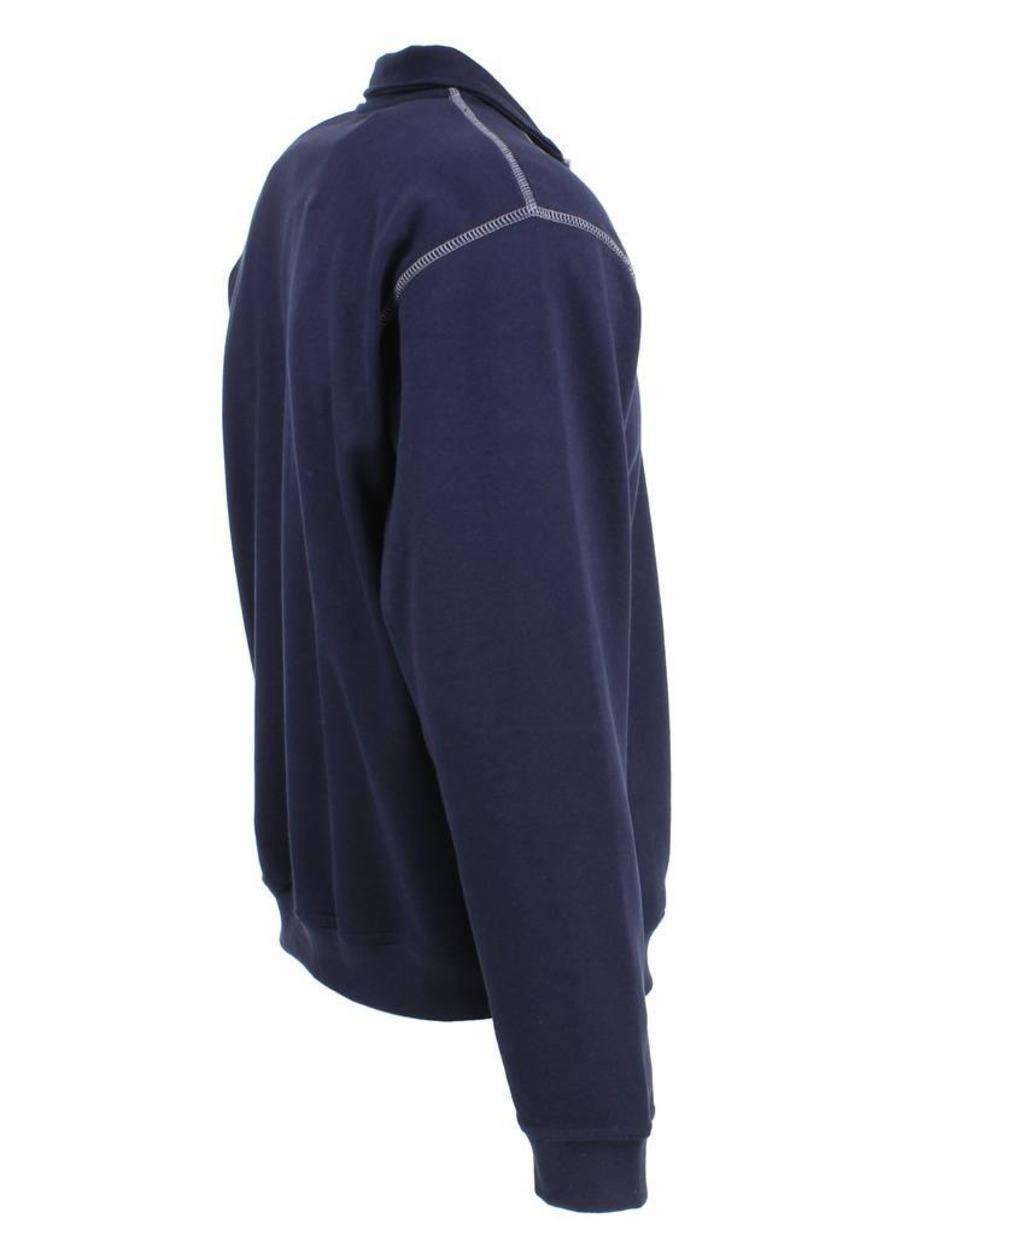 FREDERIK Zip Sweater